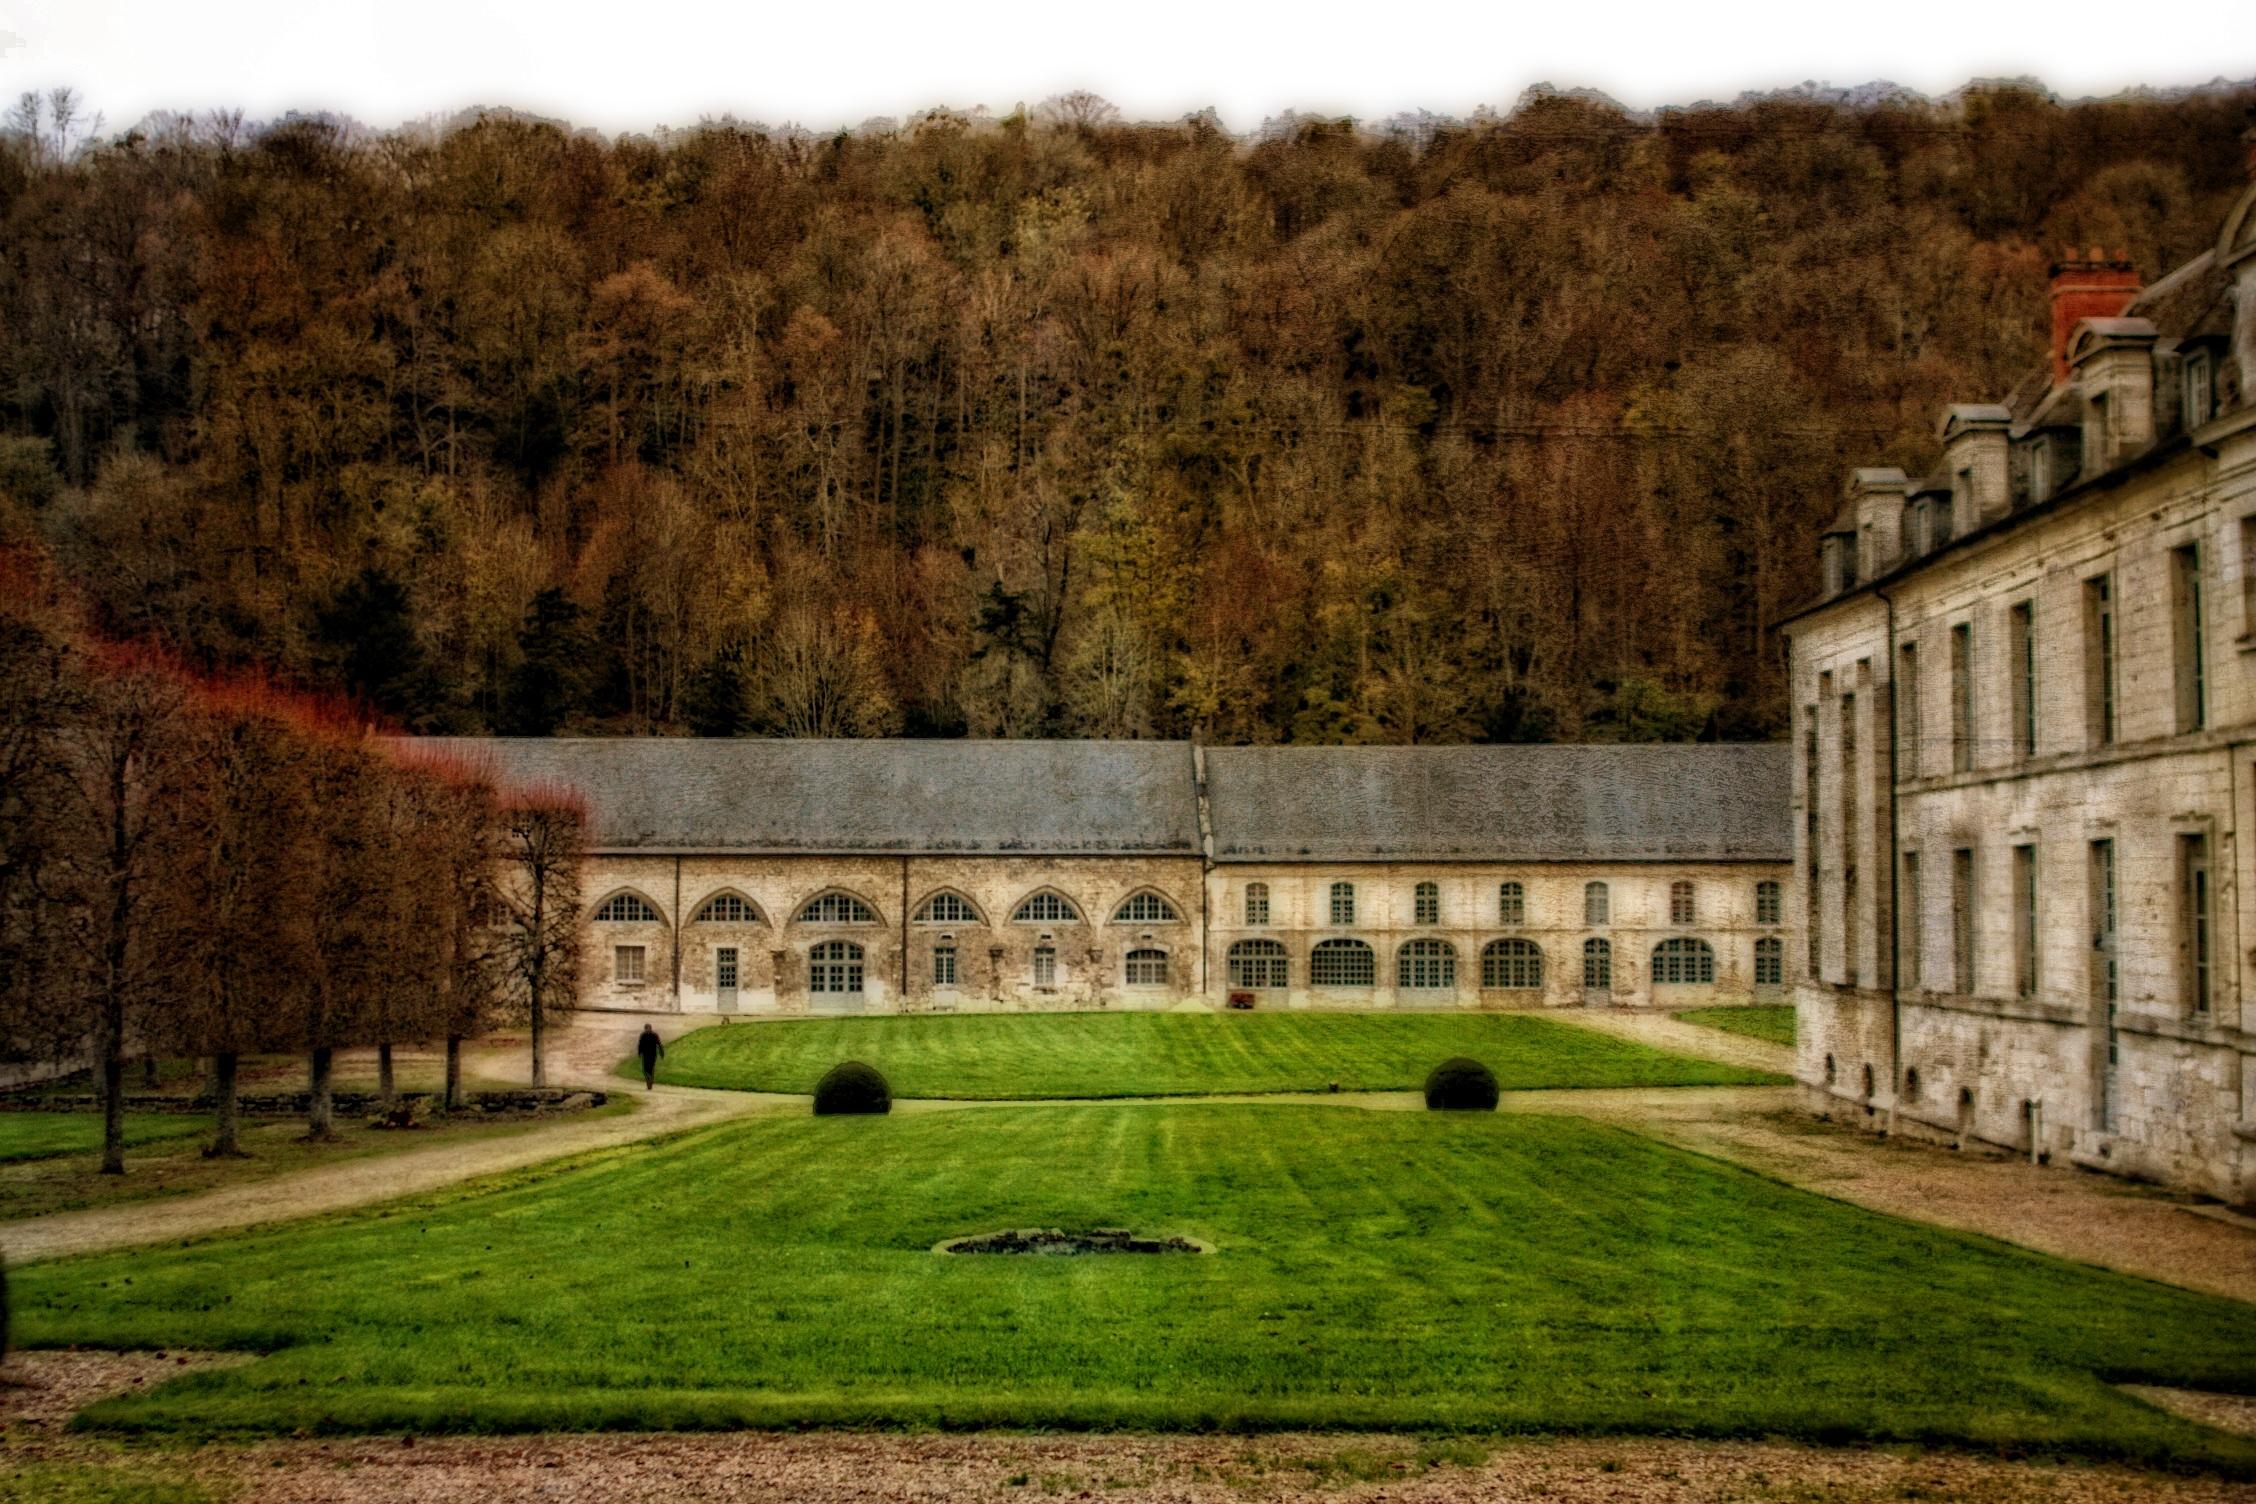 Free Images : landscape, grass, architecture, lawn, mansion, chateau ...